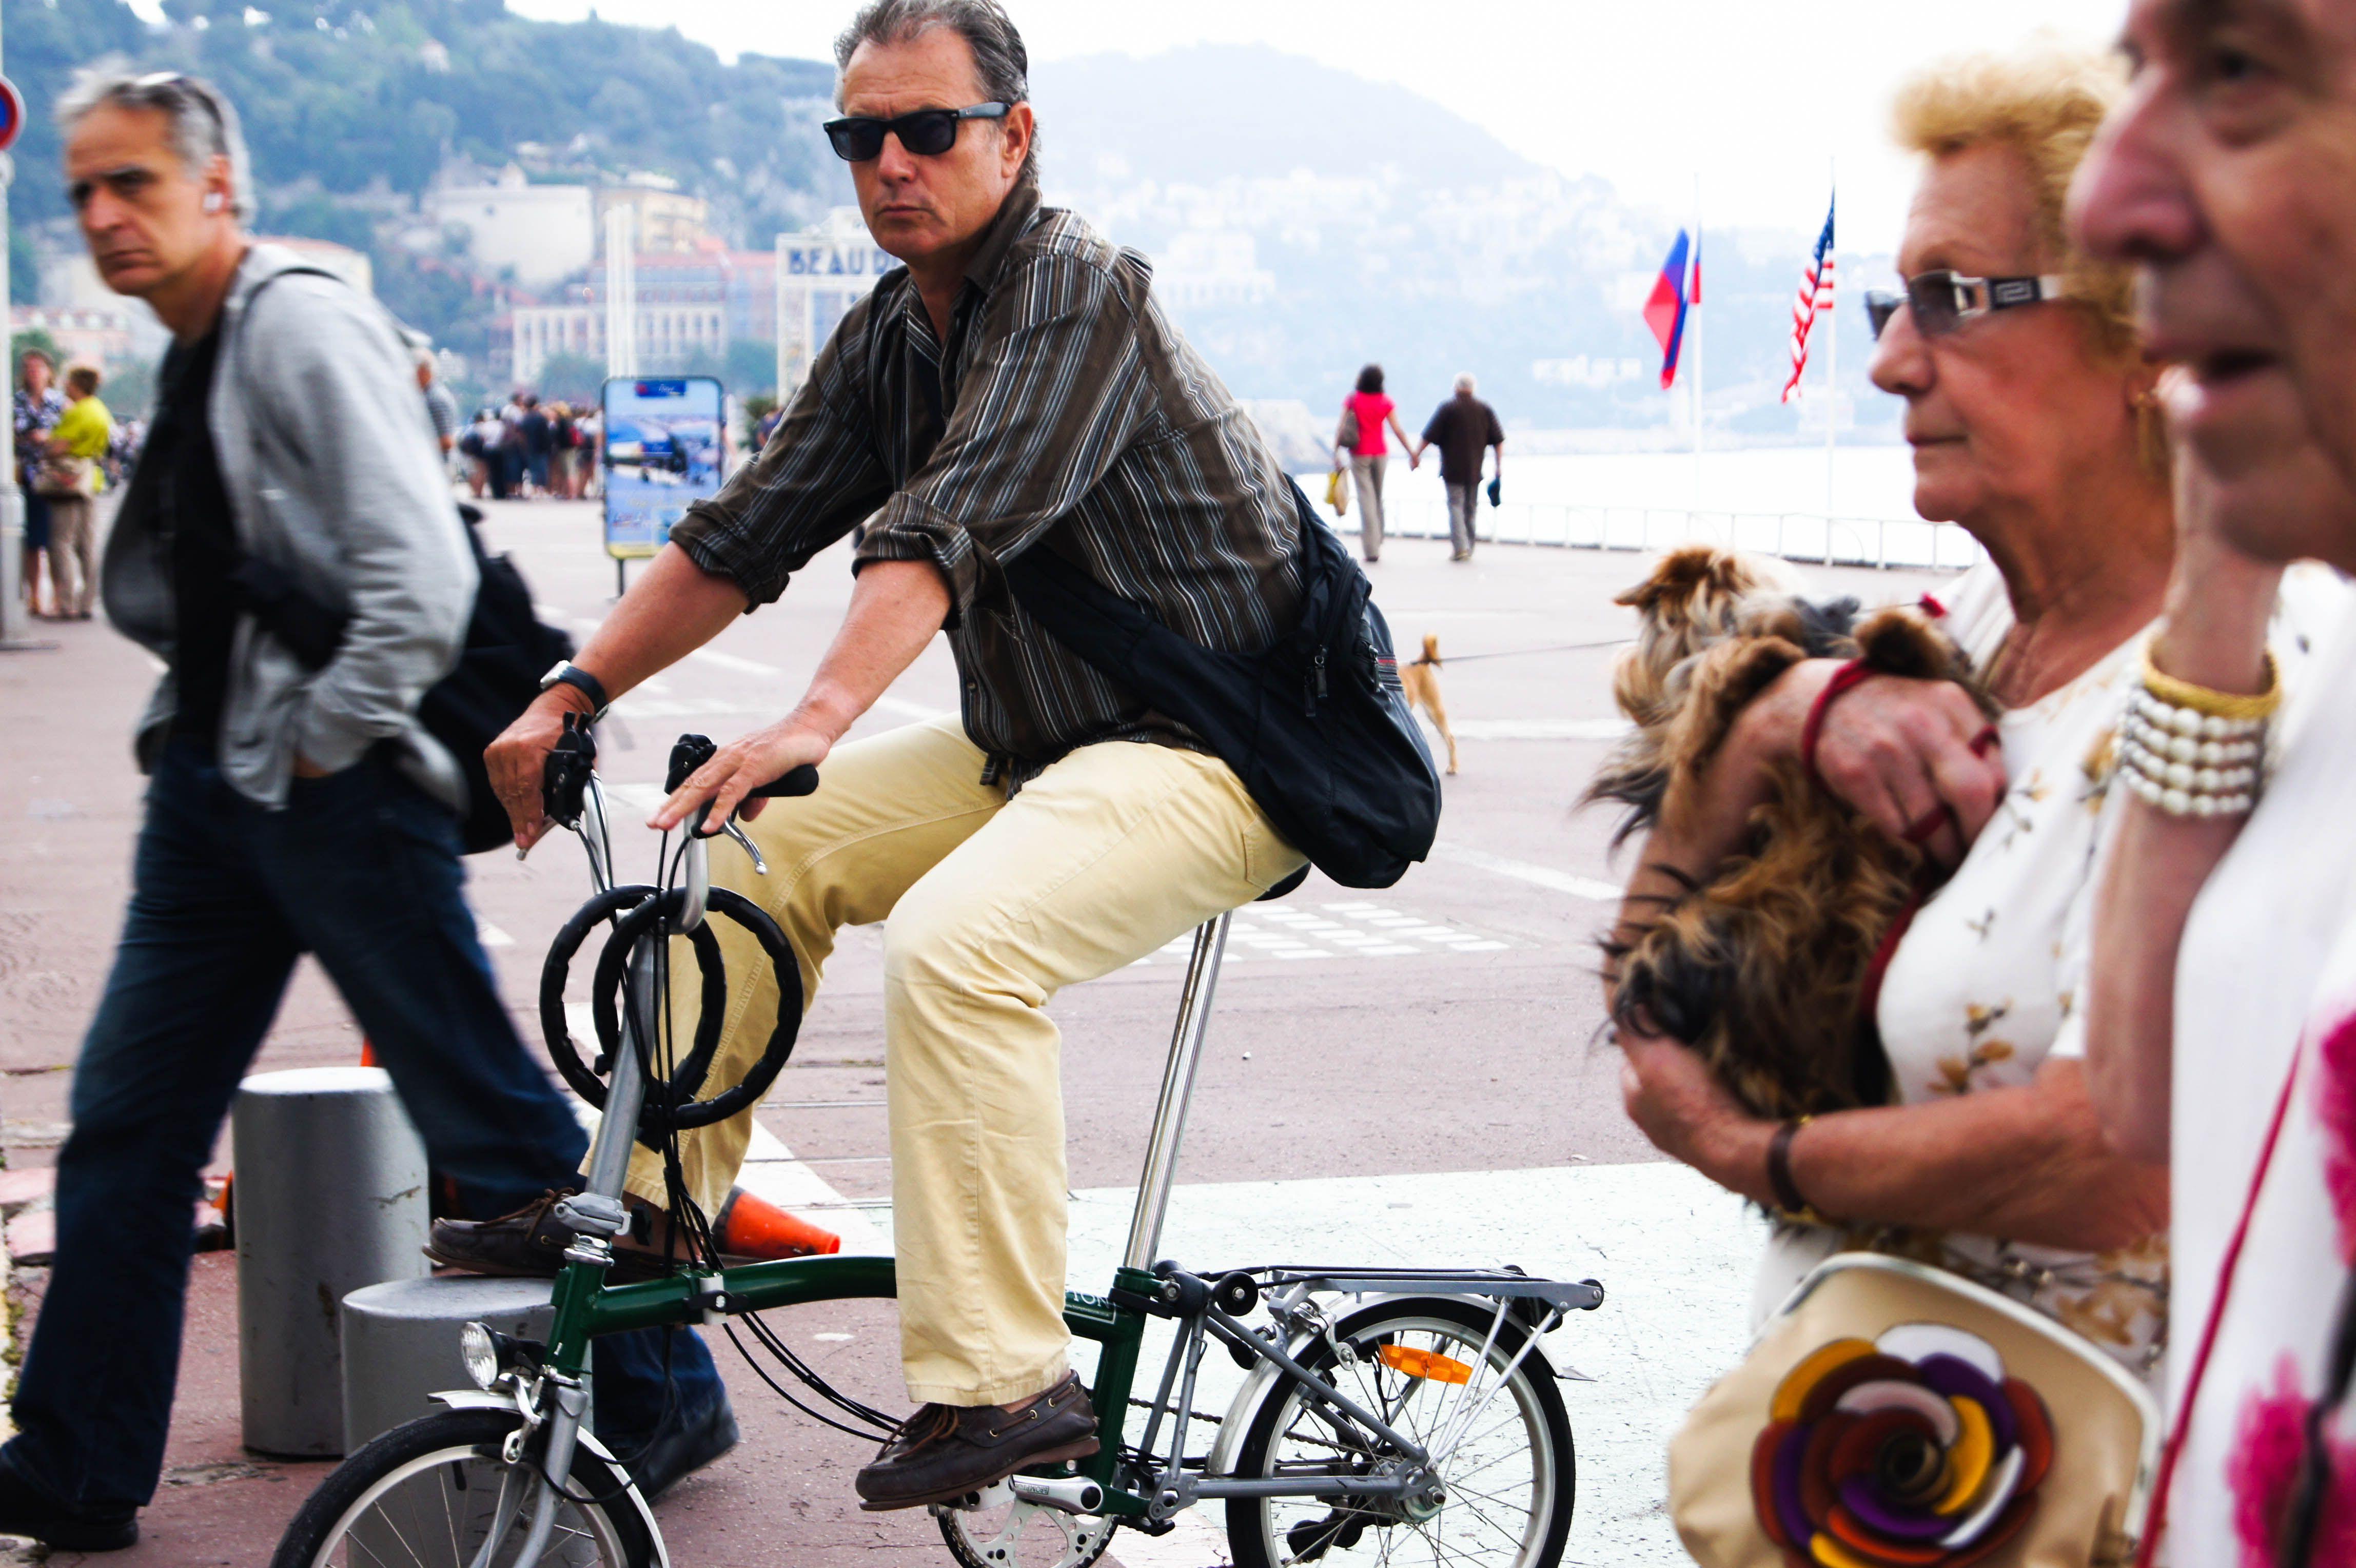 Man riding bike in Nice provence-alpes-cote d'azur - #france #nice #bikeriding #travel #streetphotography